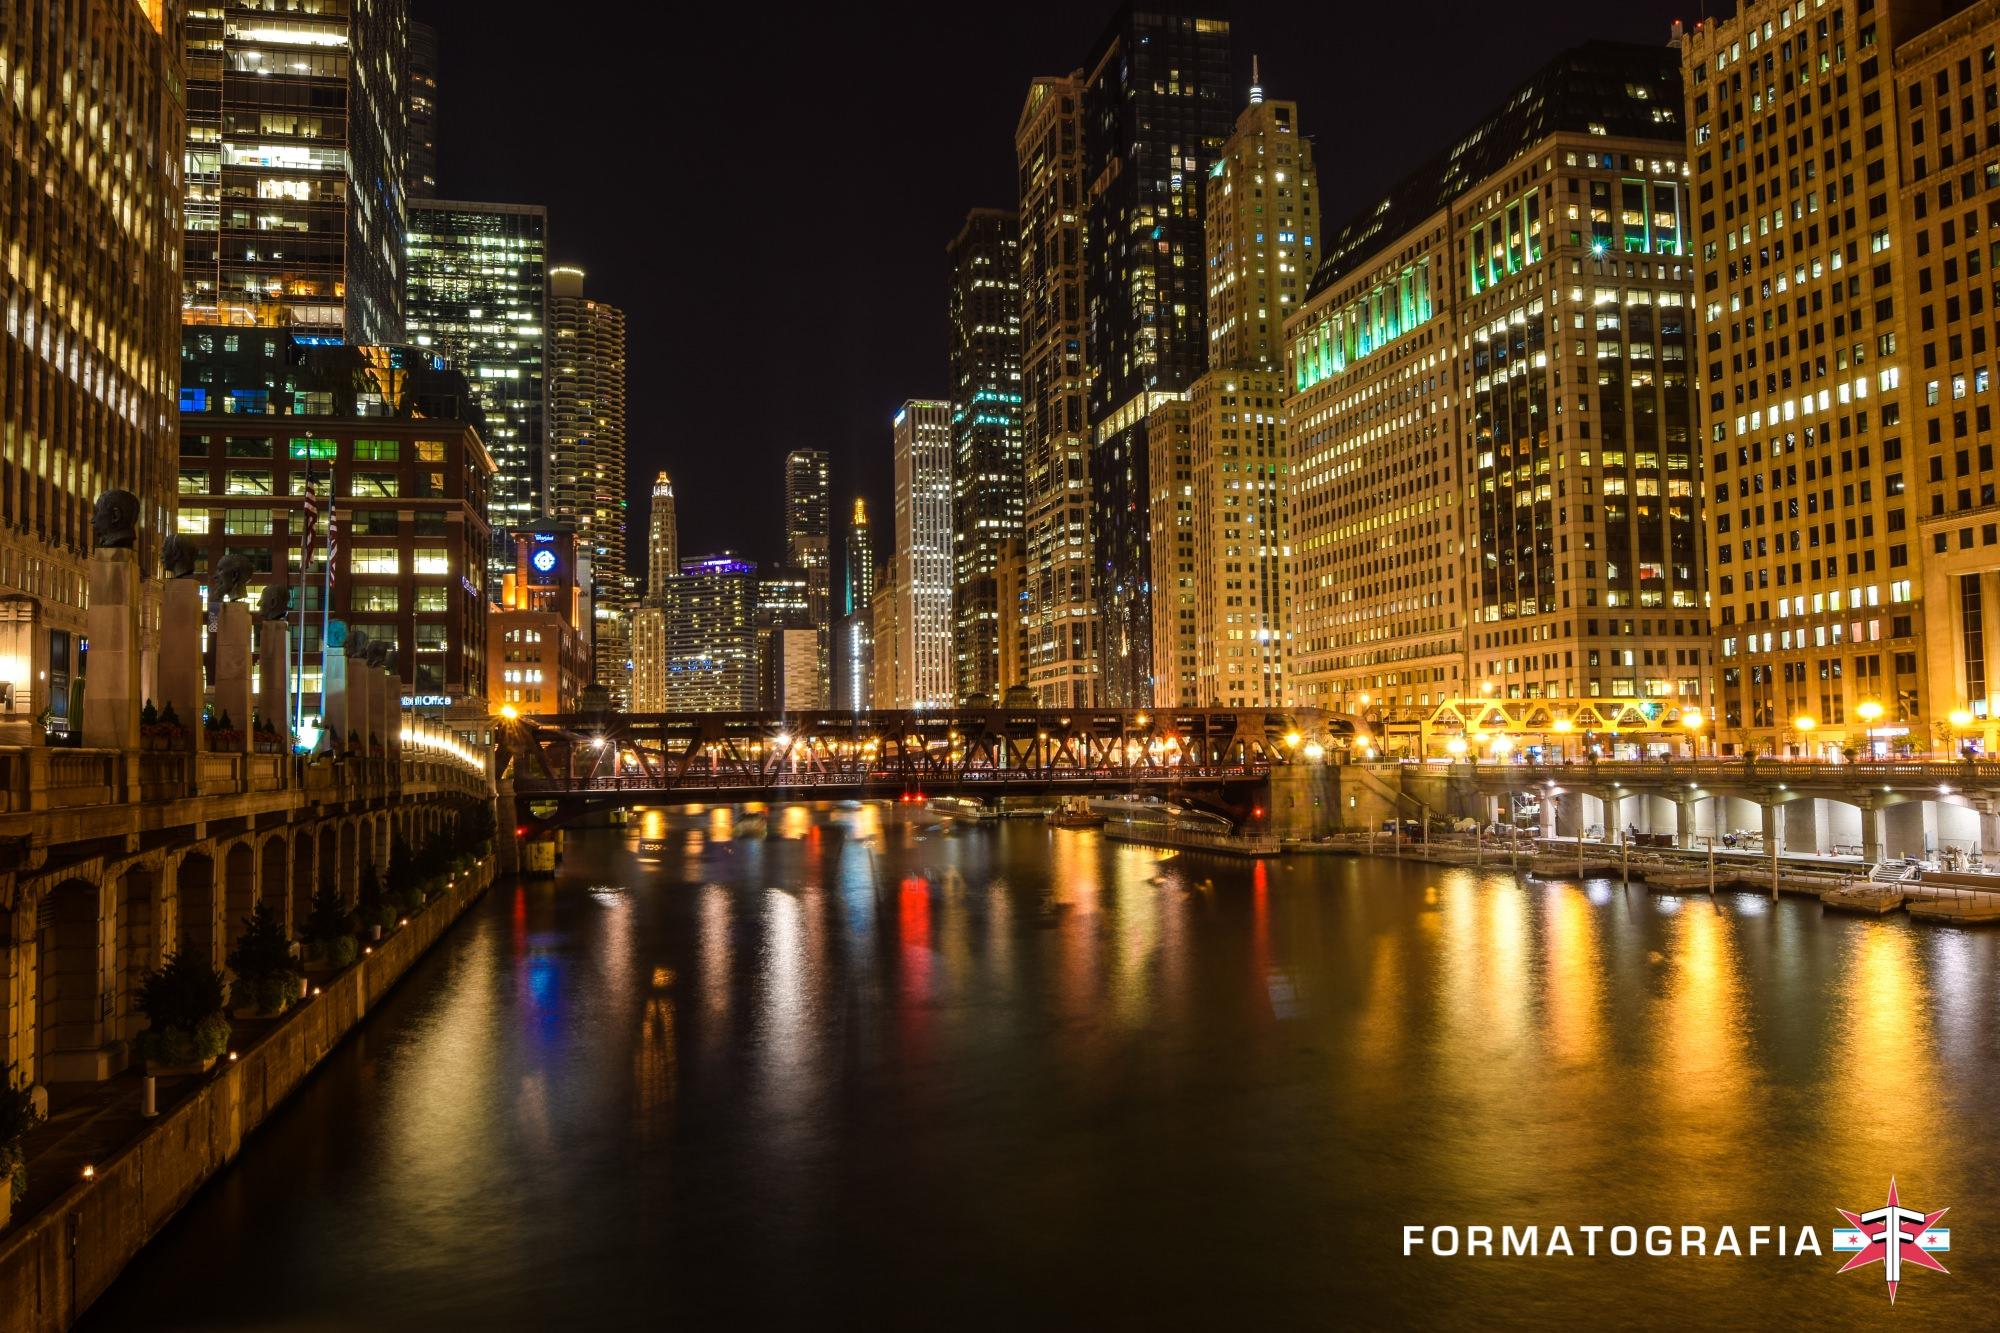 eric formato chicago photographer fall update city architecture shotsDSC_0983.jpg